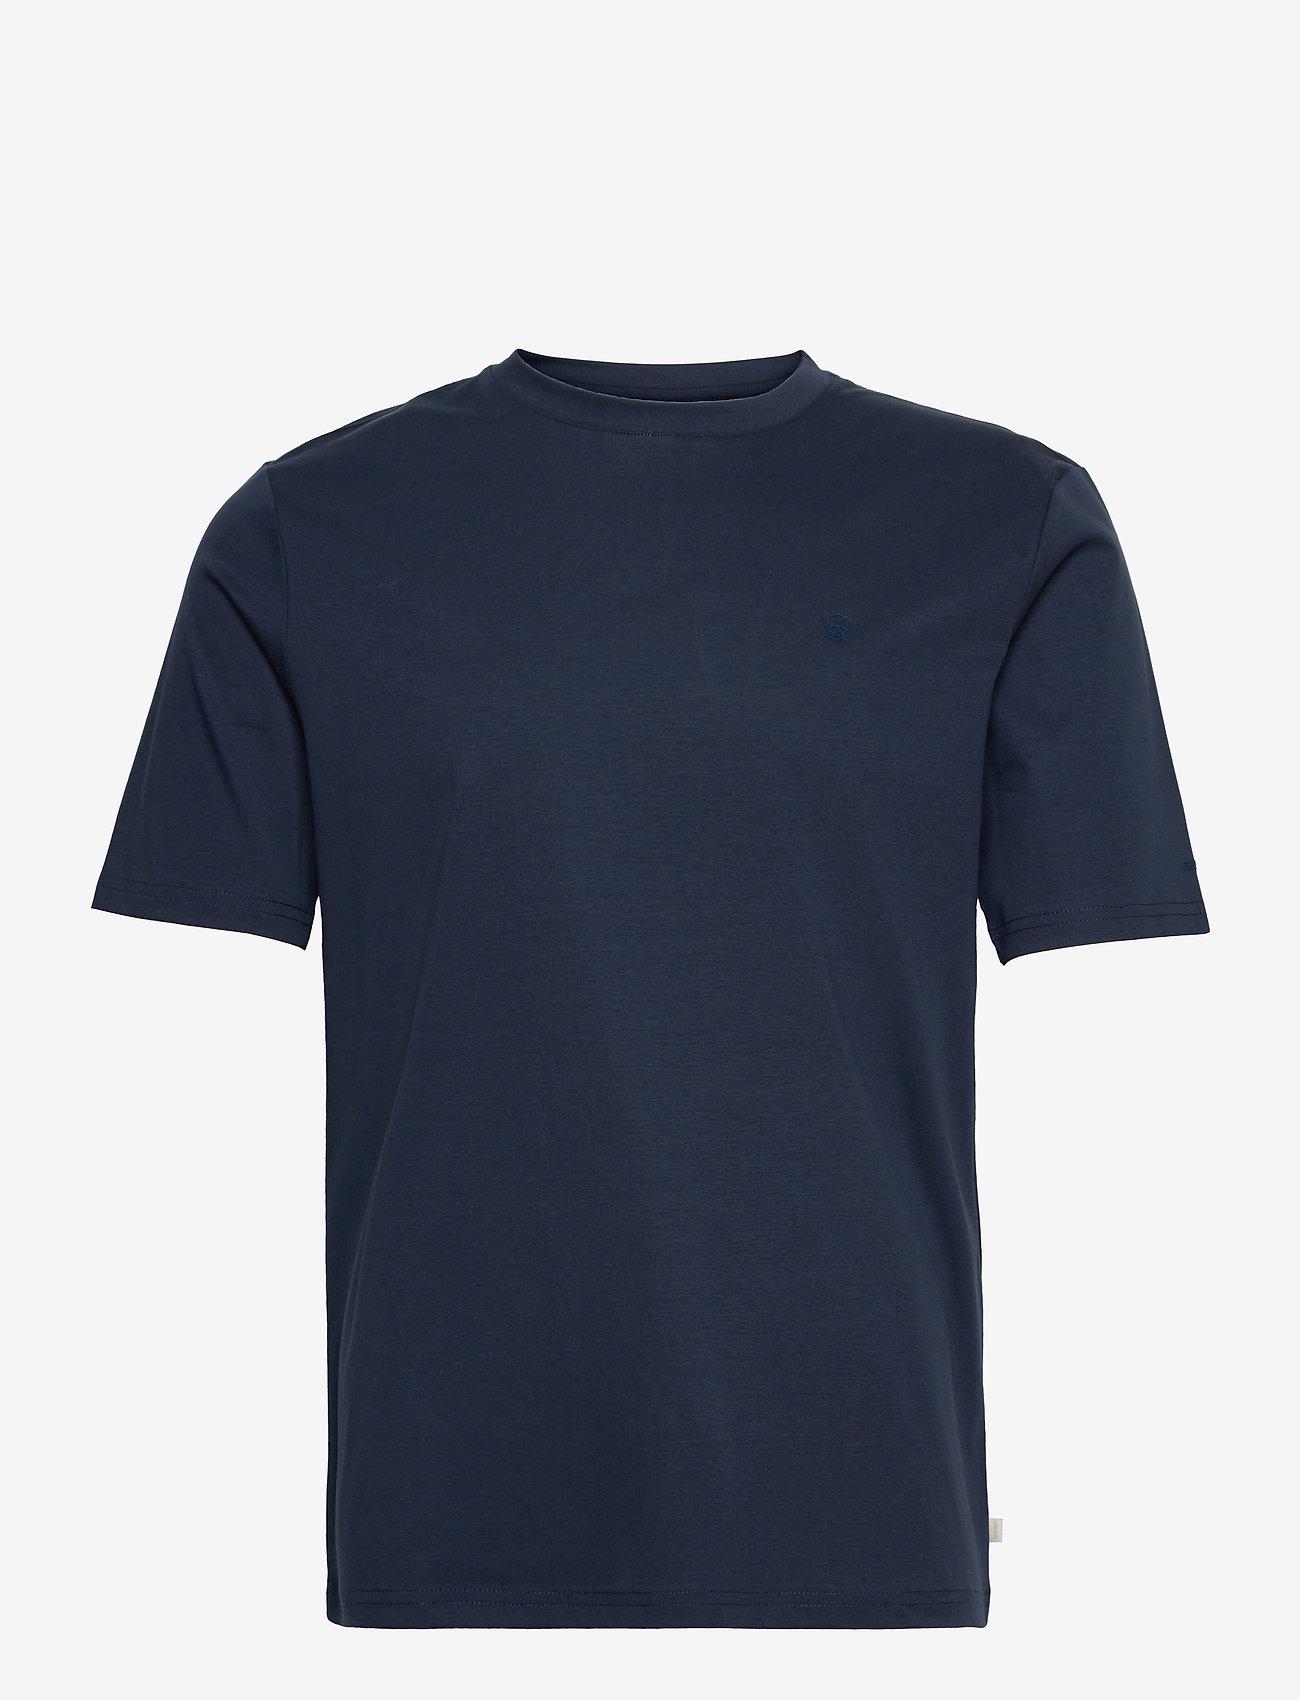 FRAM - Fram Basic Tee - basic t-shirts - sky captain - 0